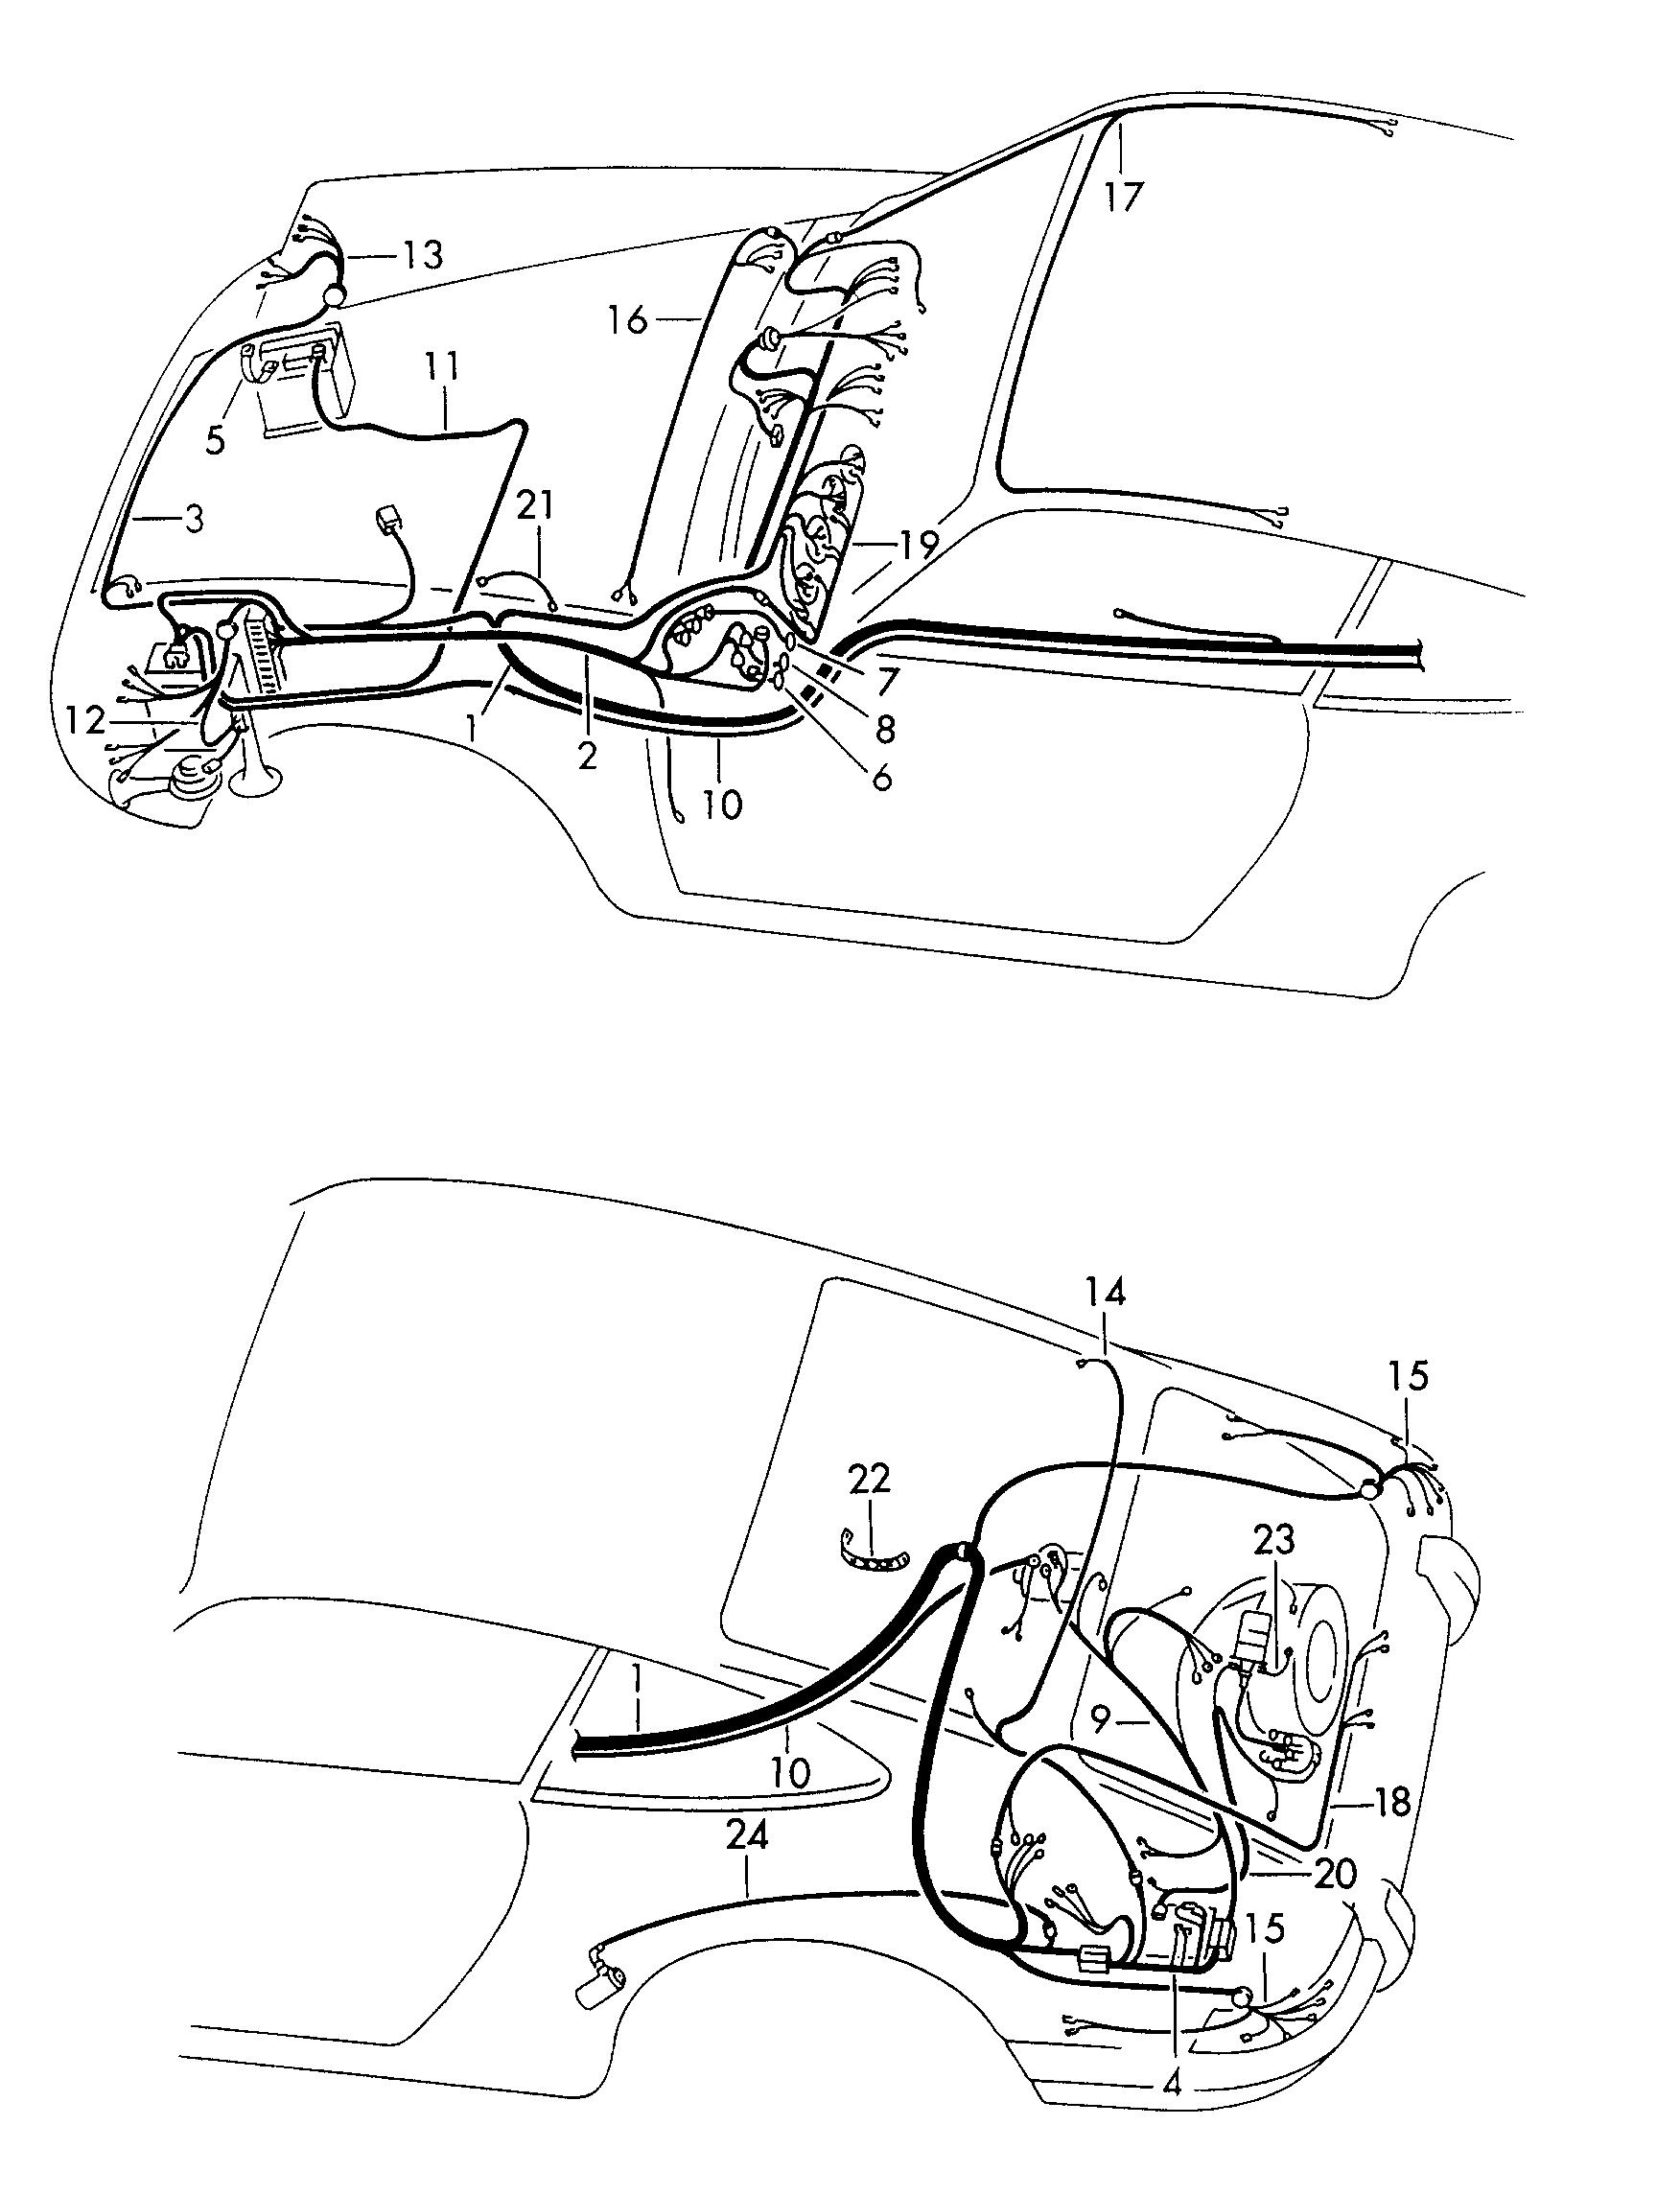 Wiring Harness 1973 Porsche 911 - Wiring Diagramsleboisenchante.fr